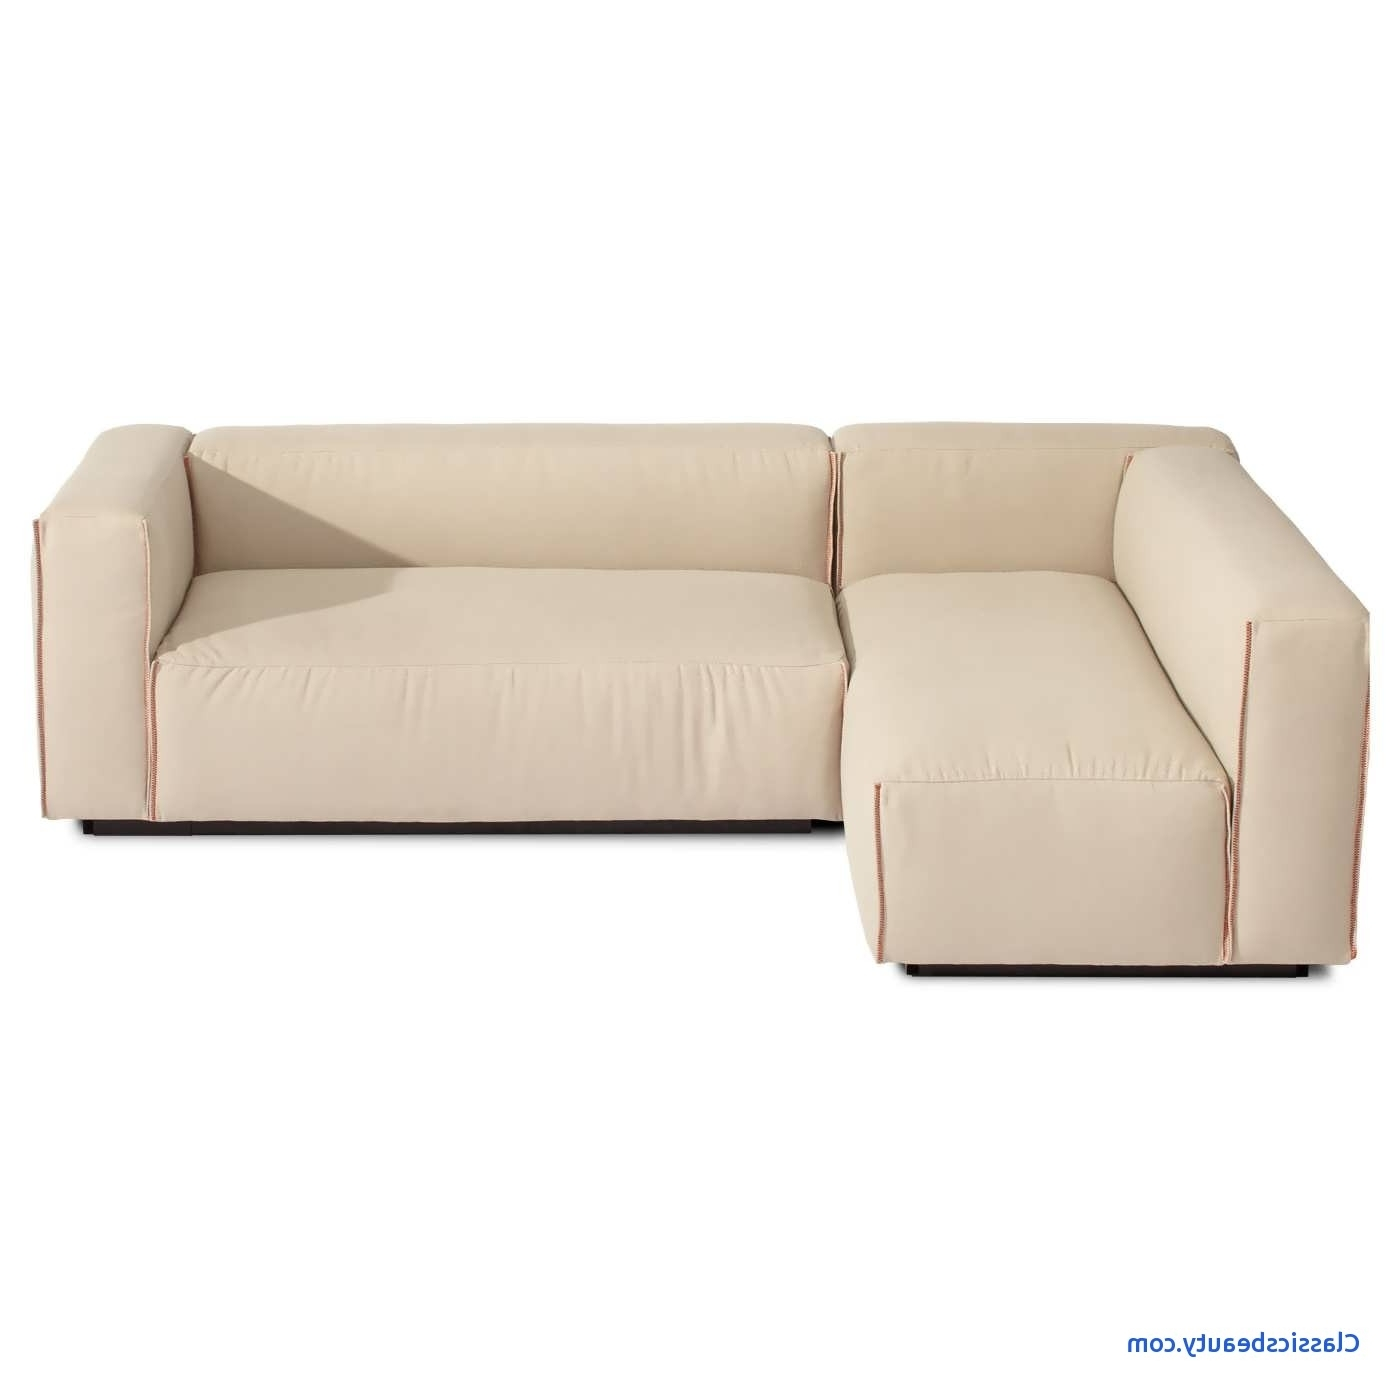 Small Sofas Elegant Sofa Corner Sofa Sectional Sleeper Sofa Chaise Regarding Widely Used Small Sofa Chaises (View 9 of 15)